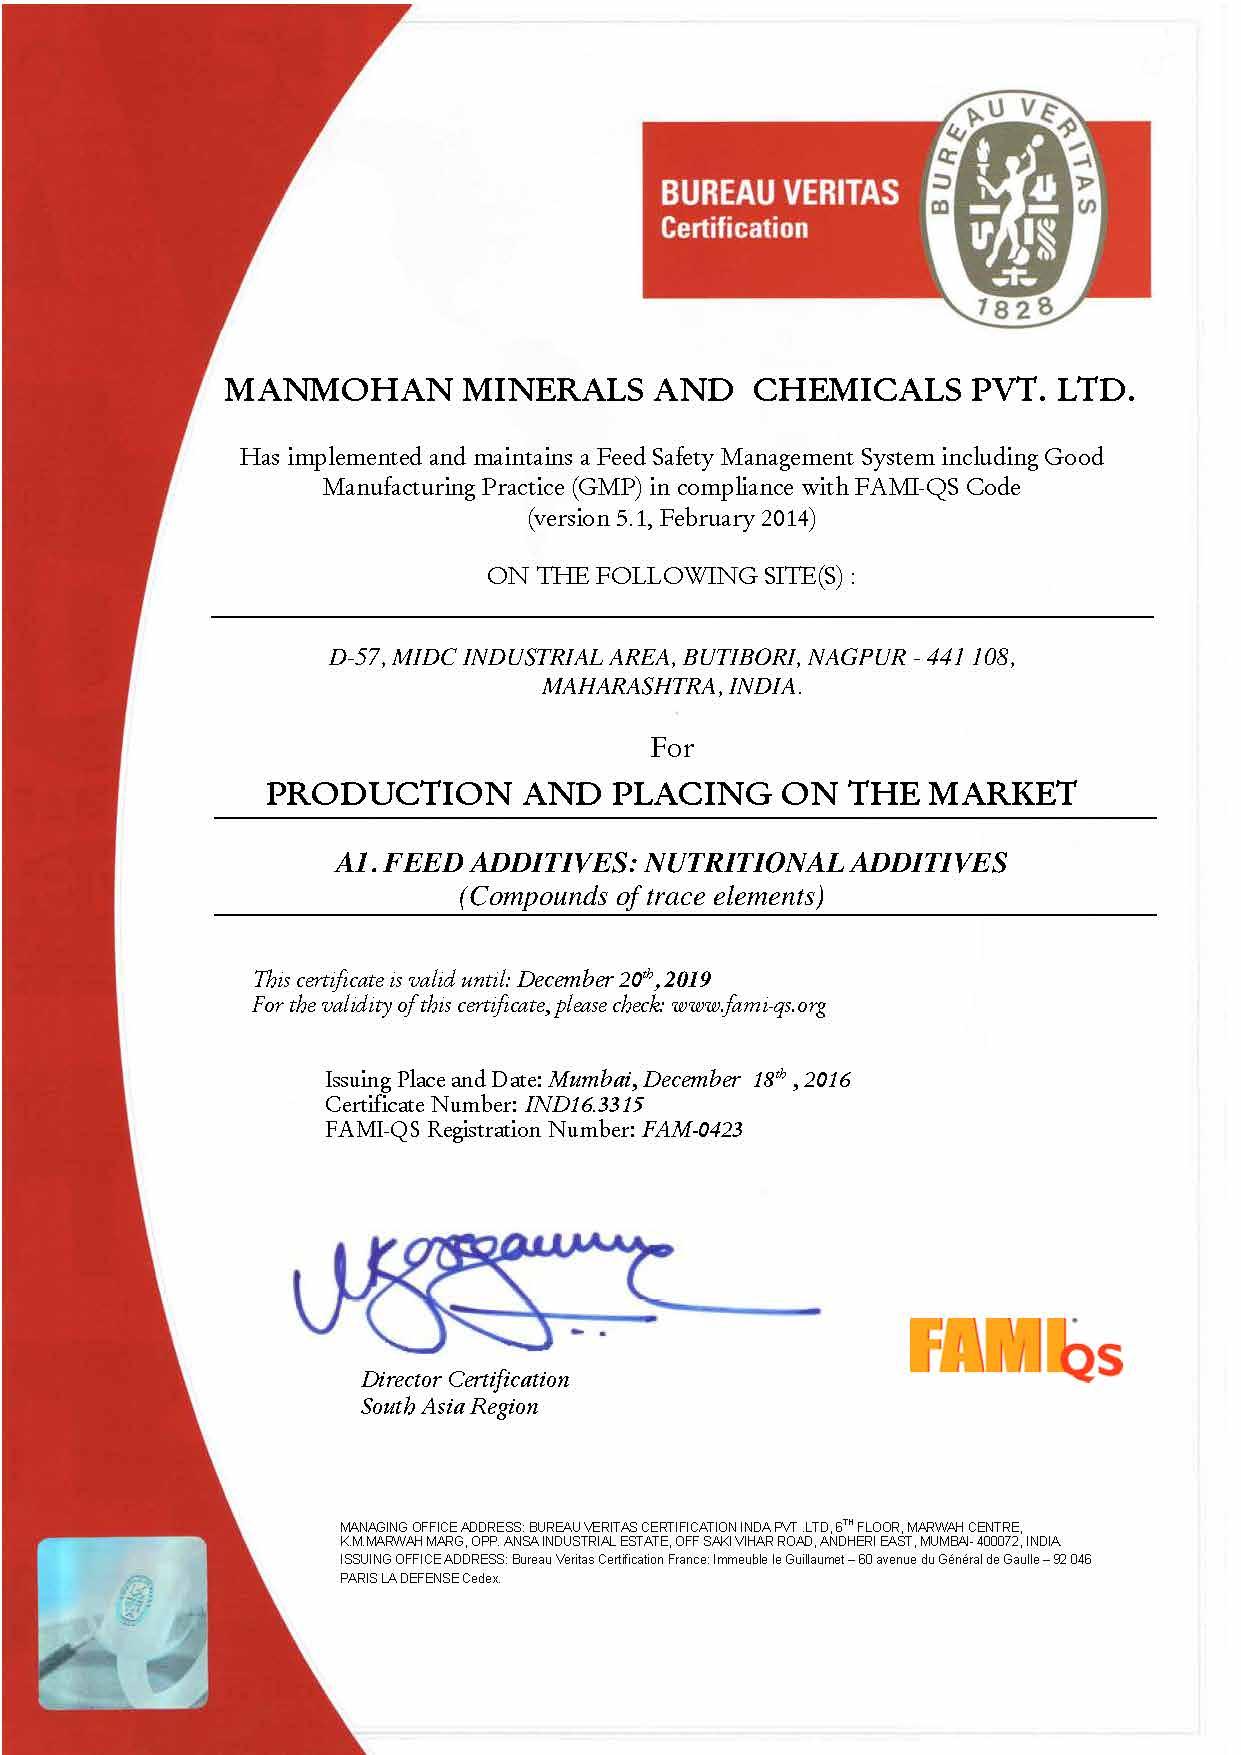 FAMI-QS CERTIFICATE 2016-19